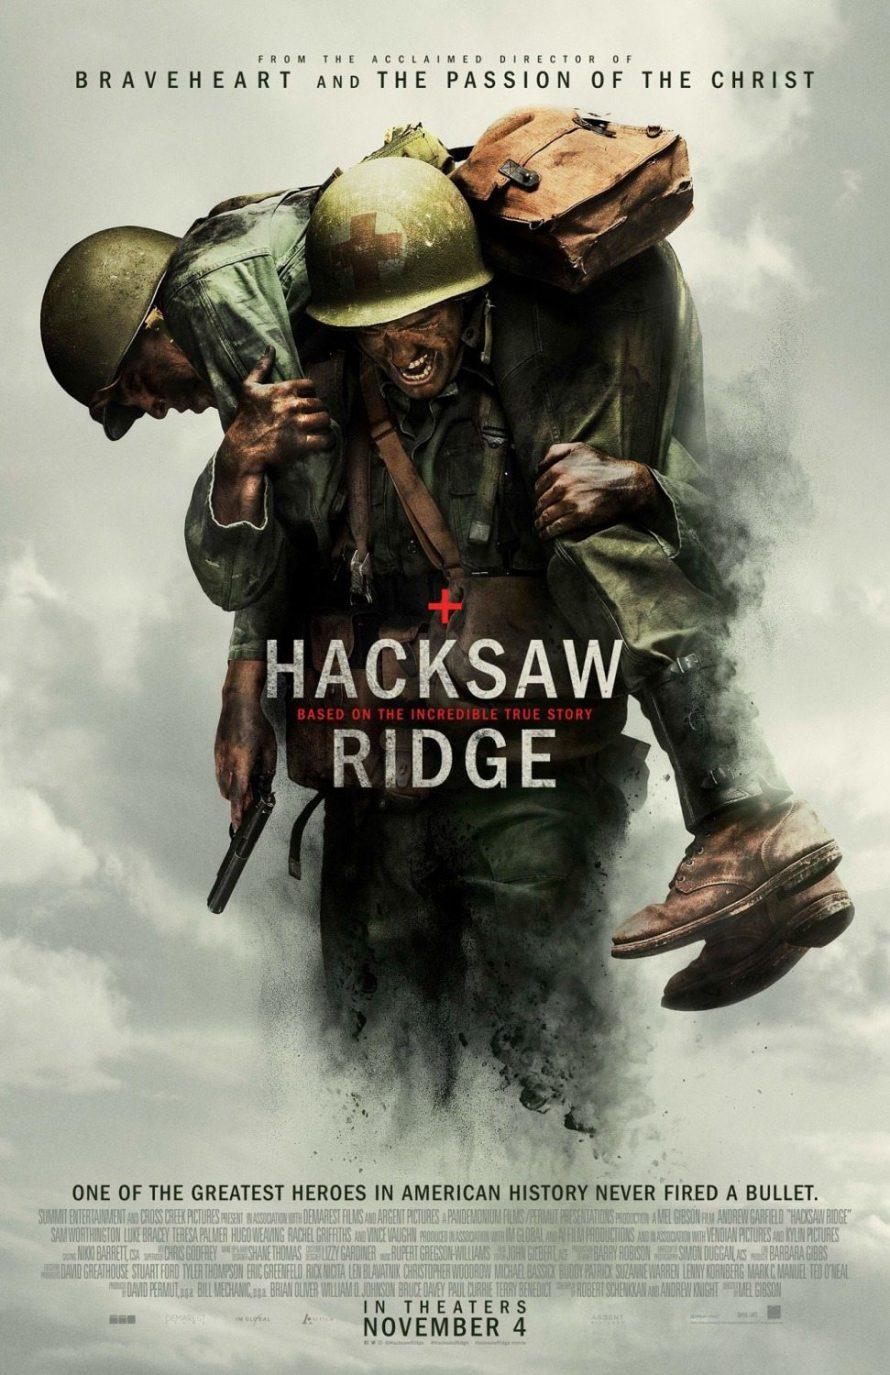 CANCELED – Classic Film Series: Hacksaw Ridge